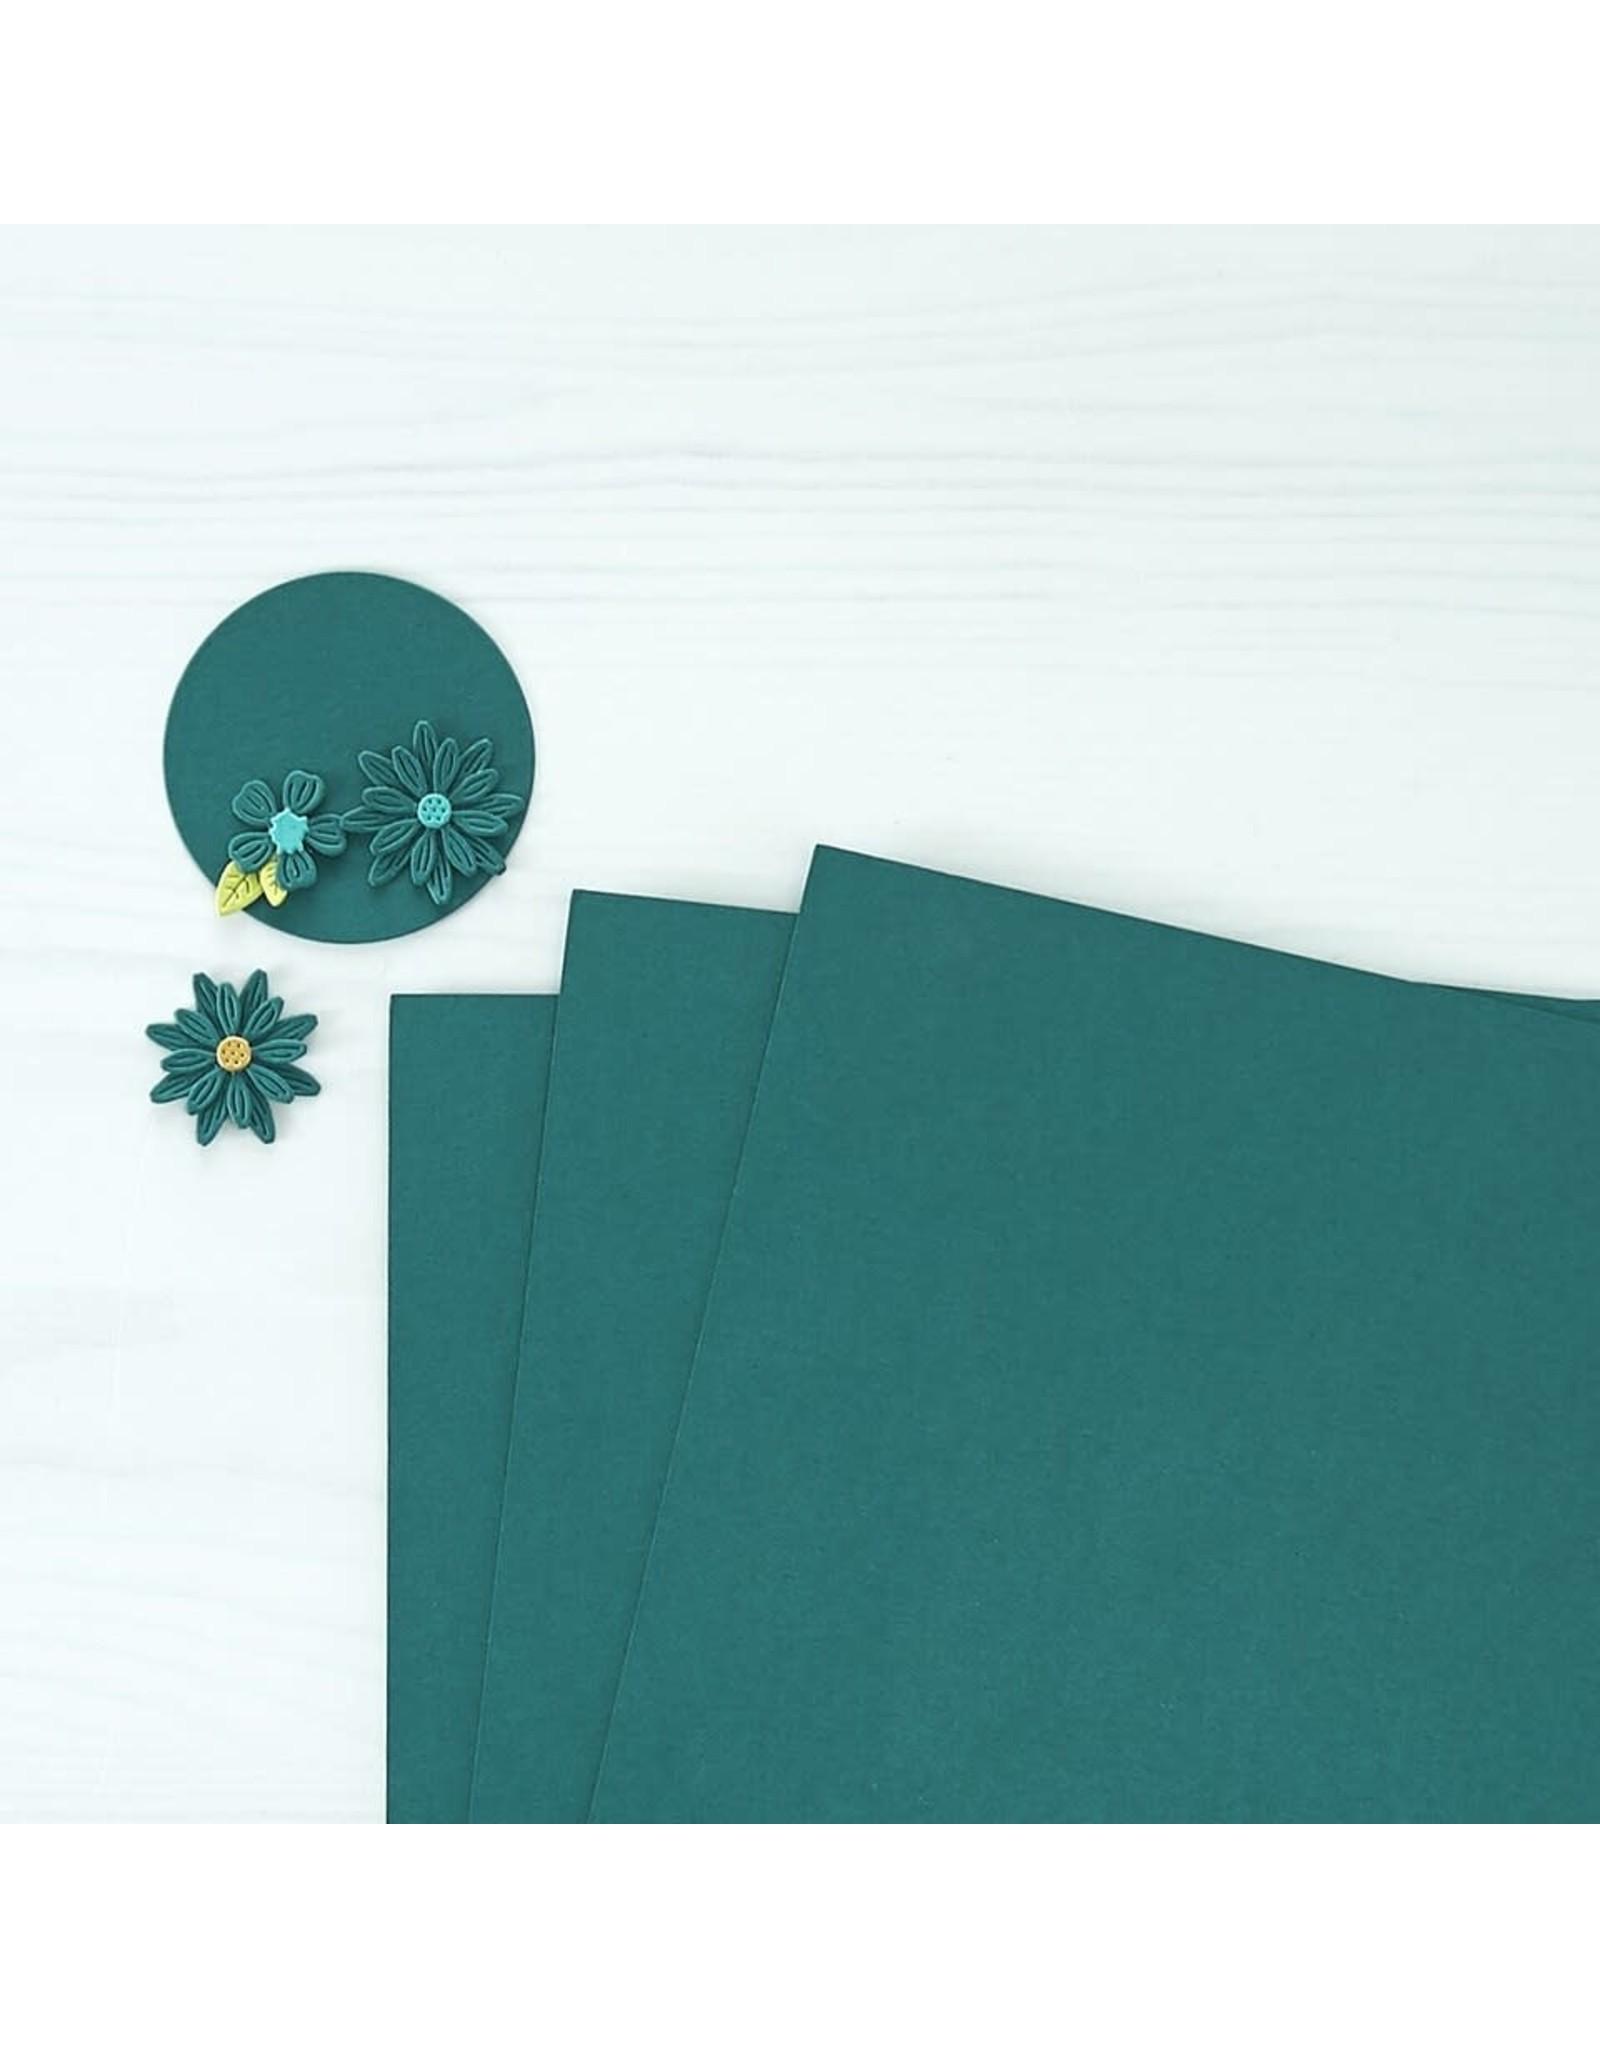 Spellbinders Blue Spruce Color Essentials Cardstock 8.5x11